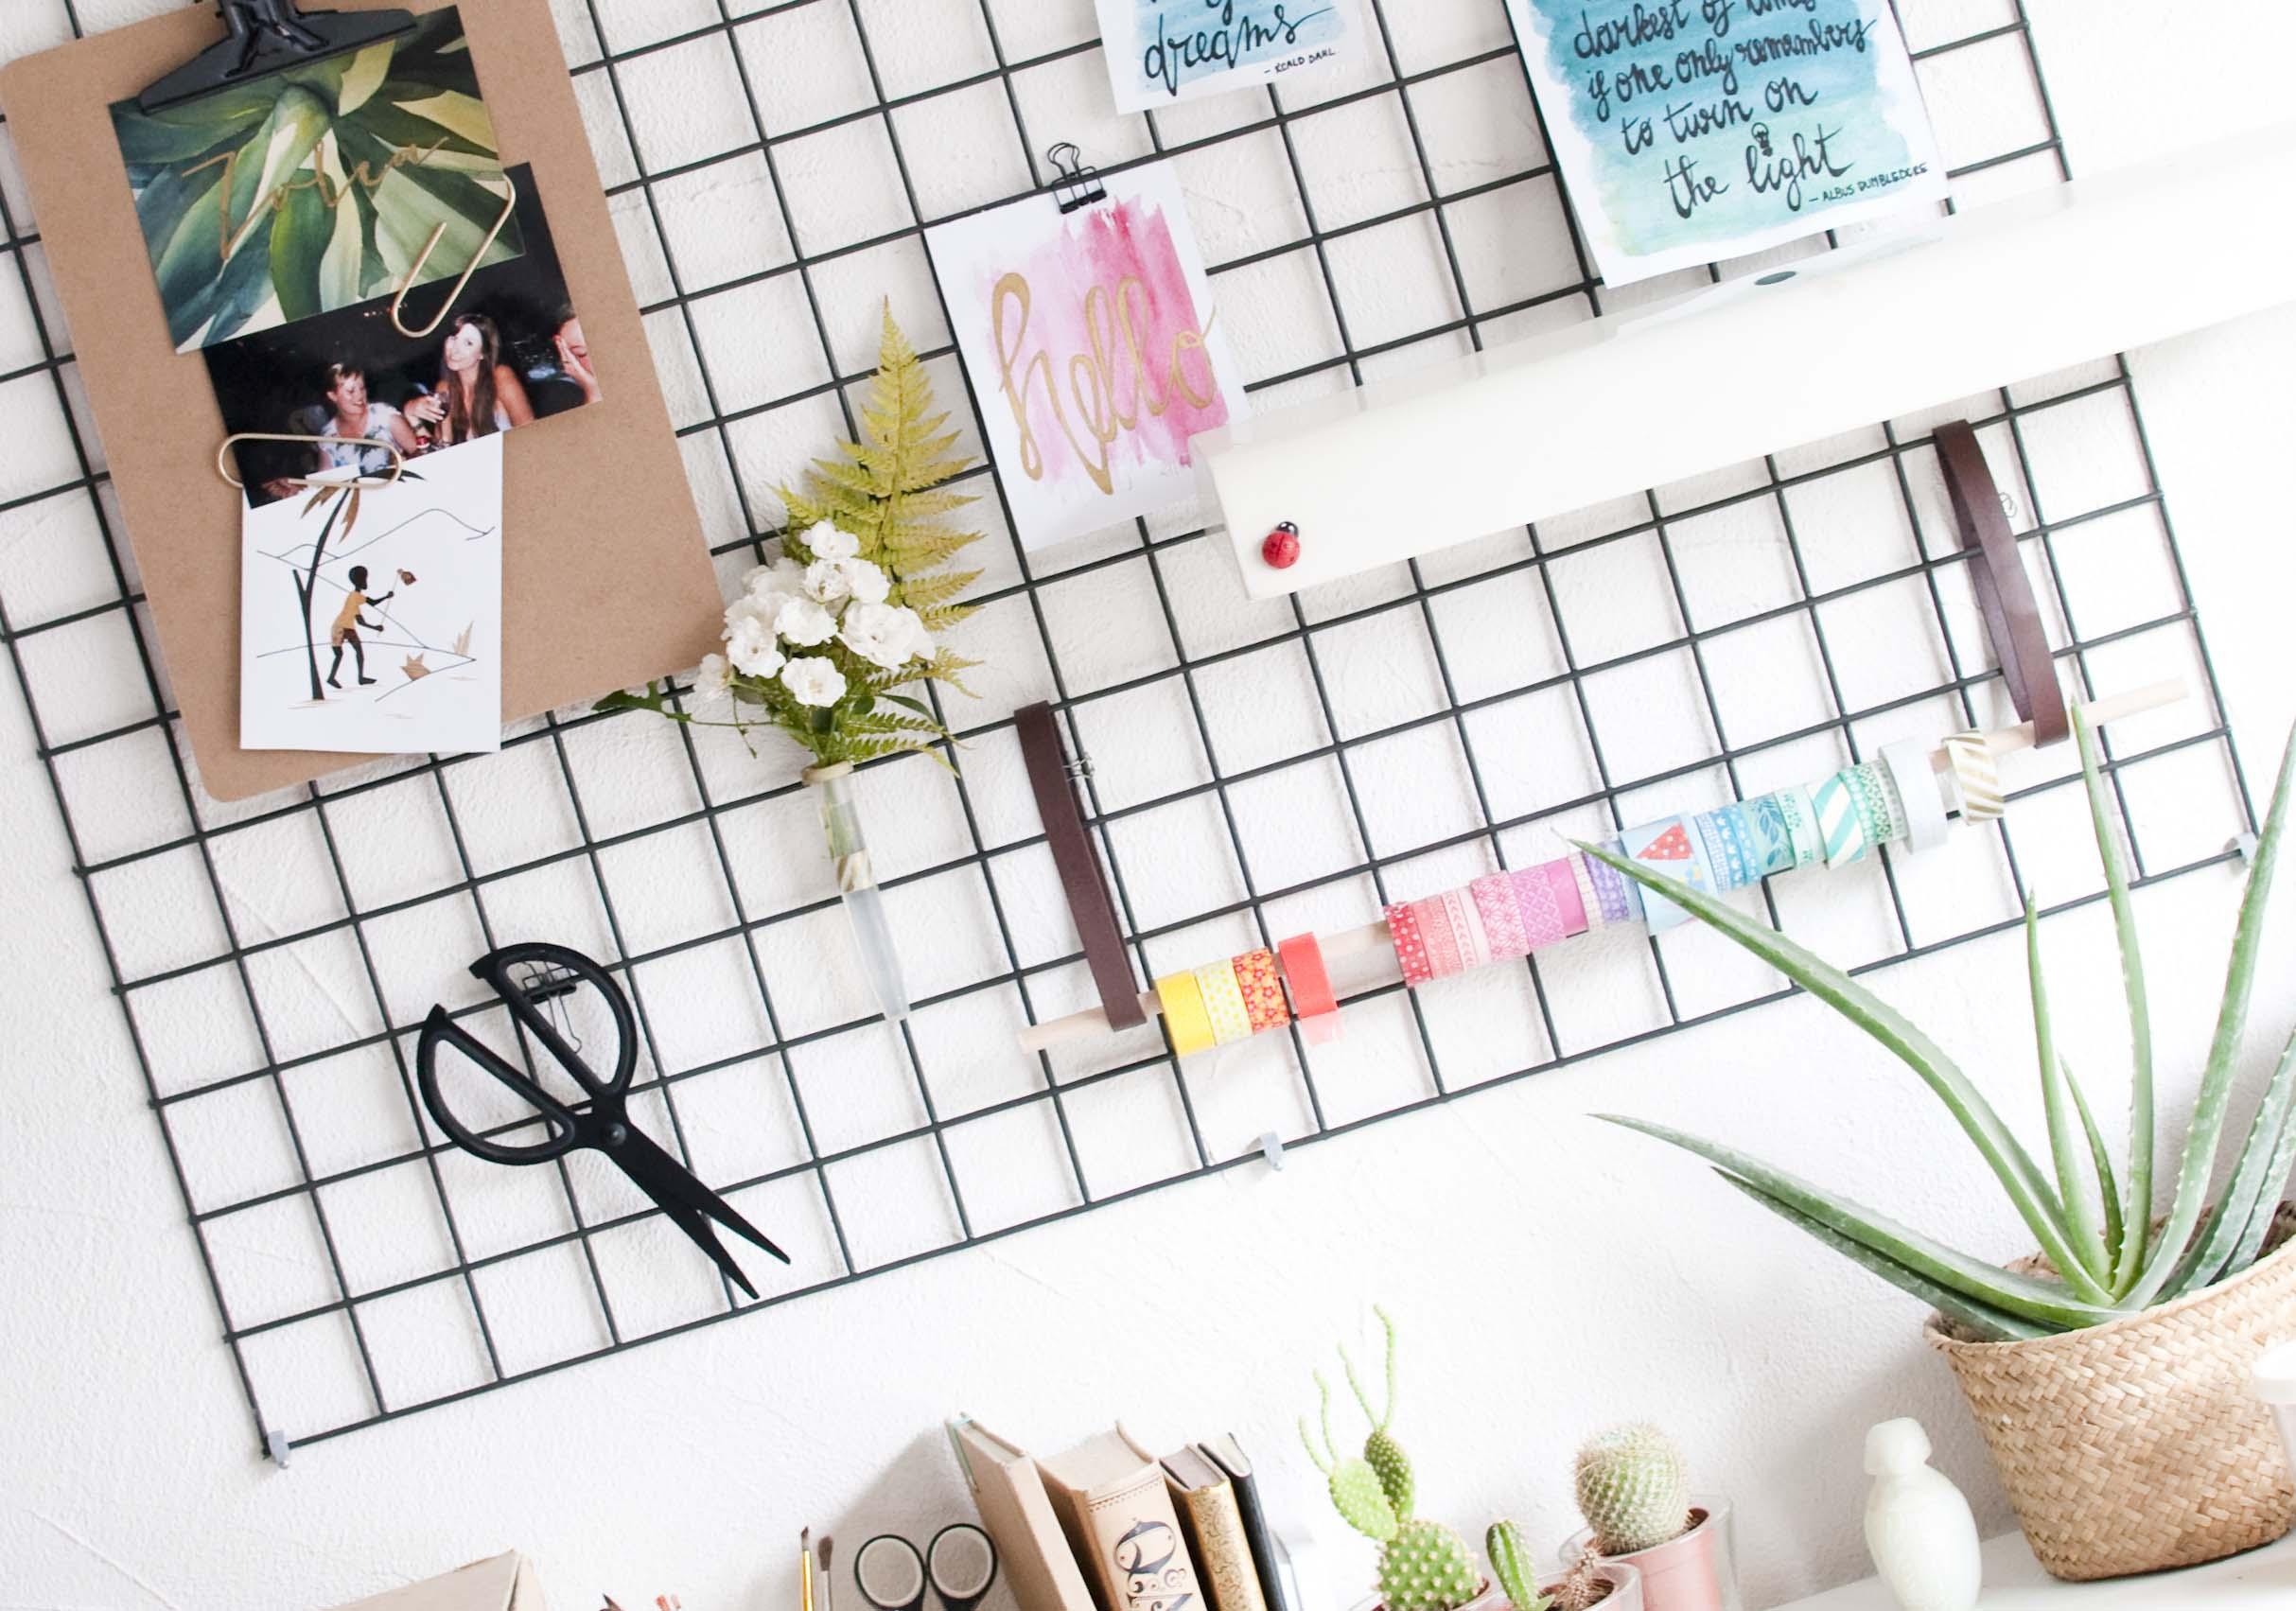 diy-wall-grid-organisation